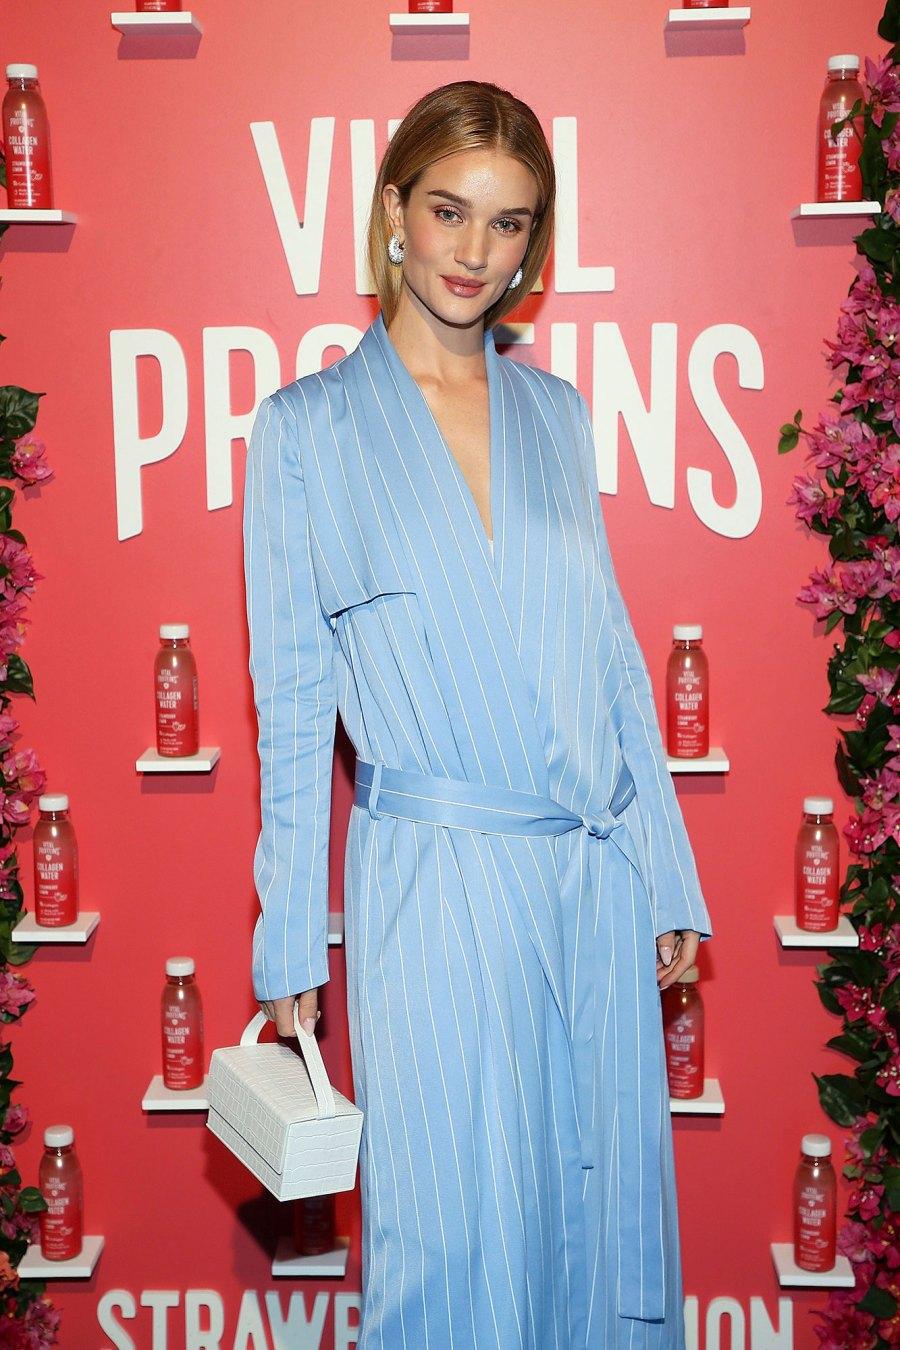 Stars Who Swear by the Celery Juice Wellness Trend: Pharrell Williams, Jenna Dewan and More